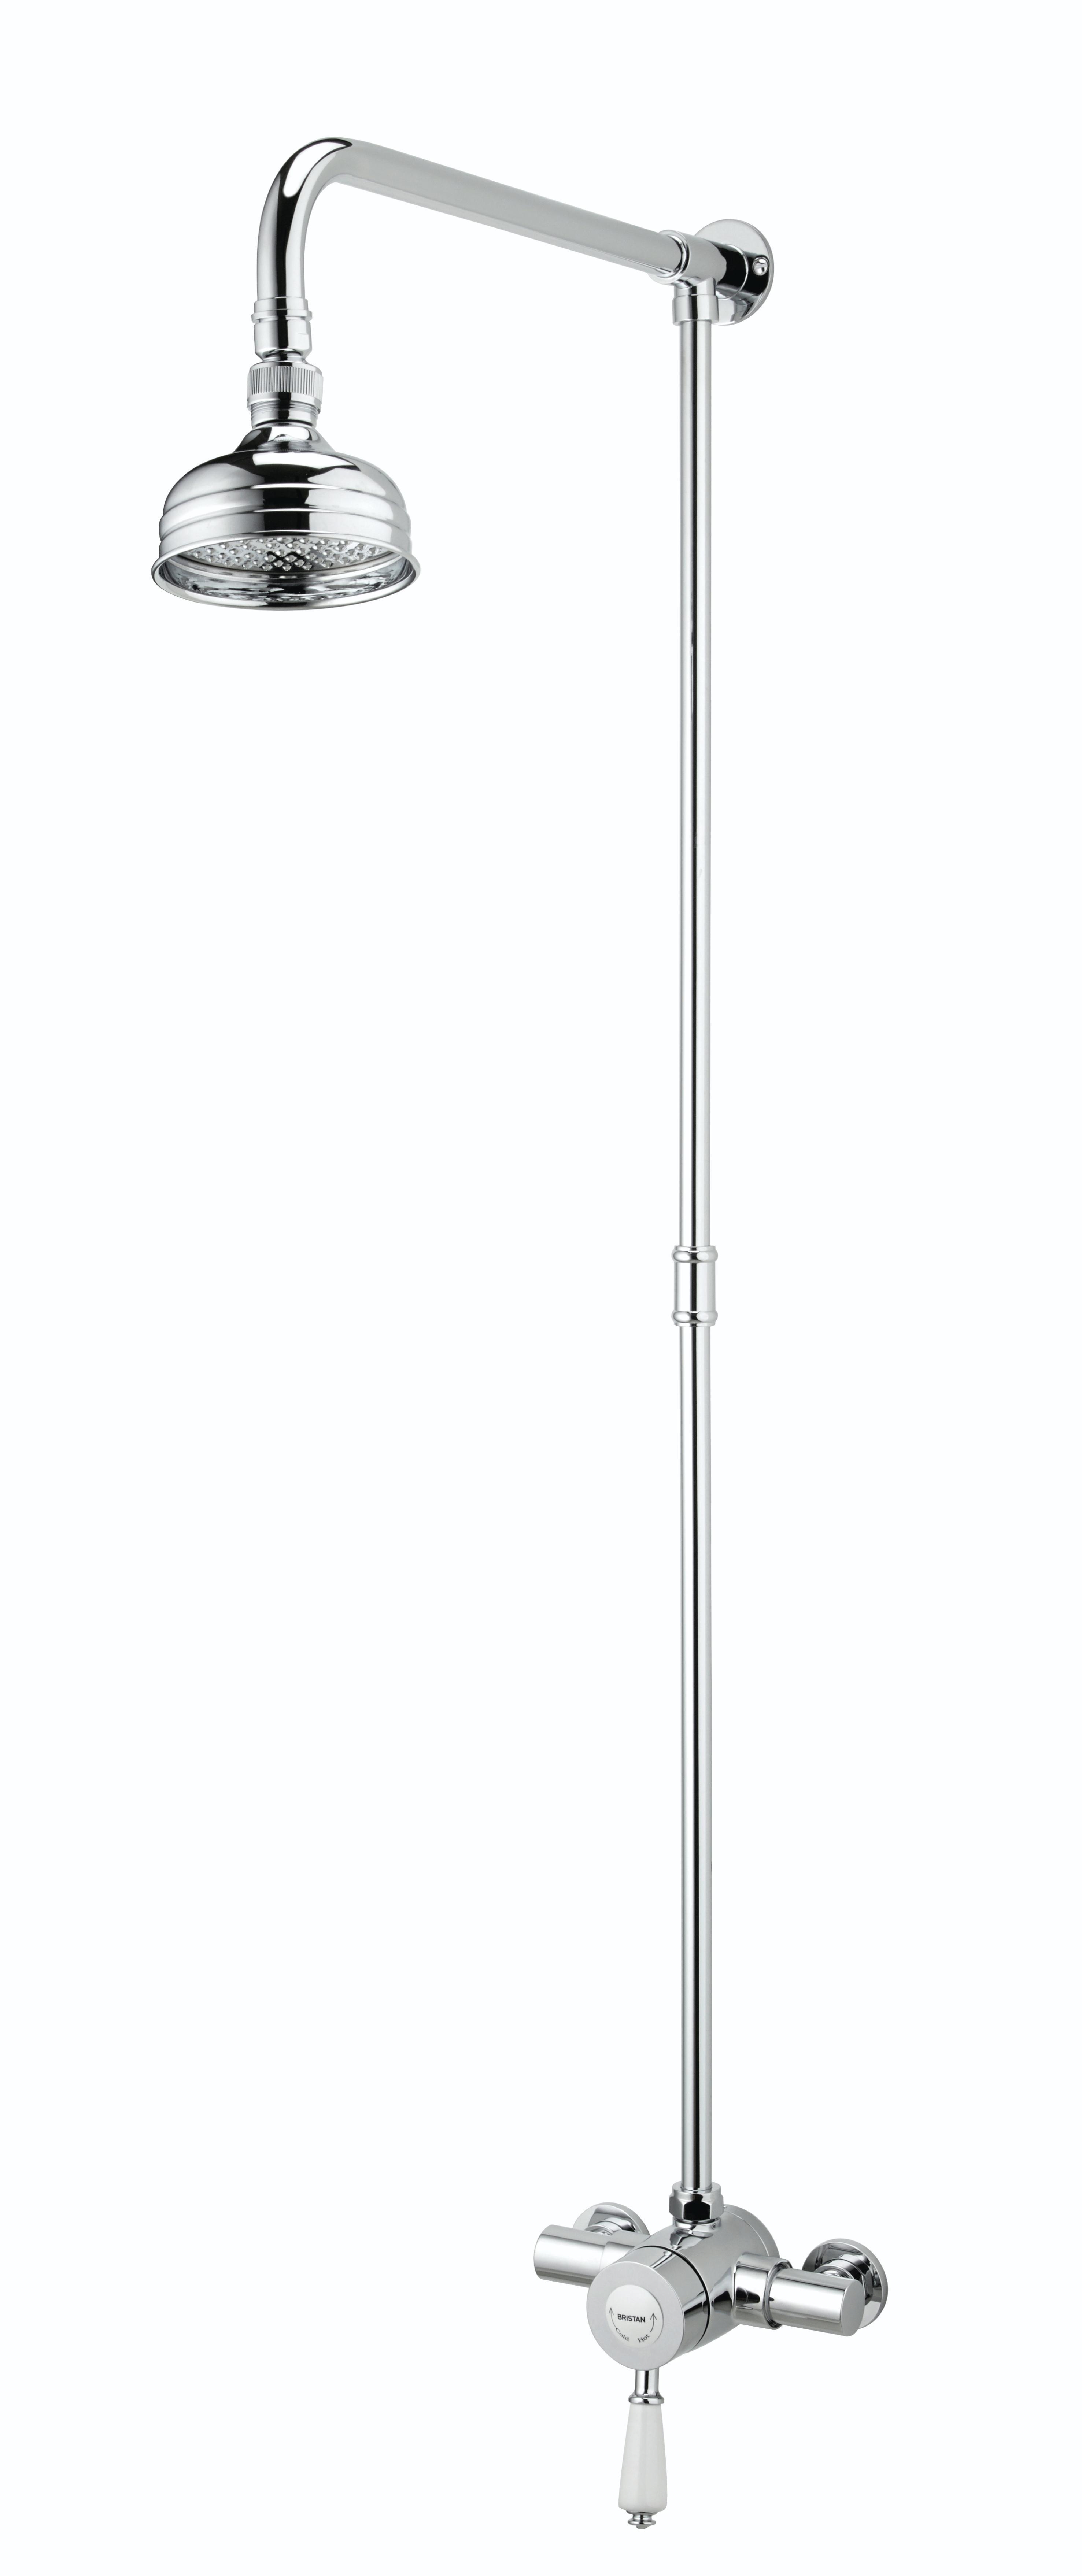 Thermostatic Exposed Mini Valve Shower with Rigid Riser